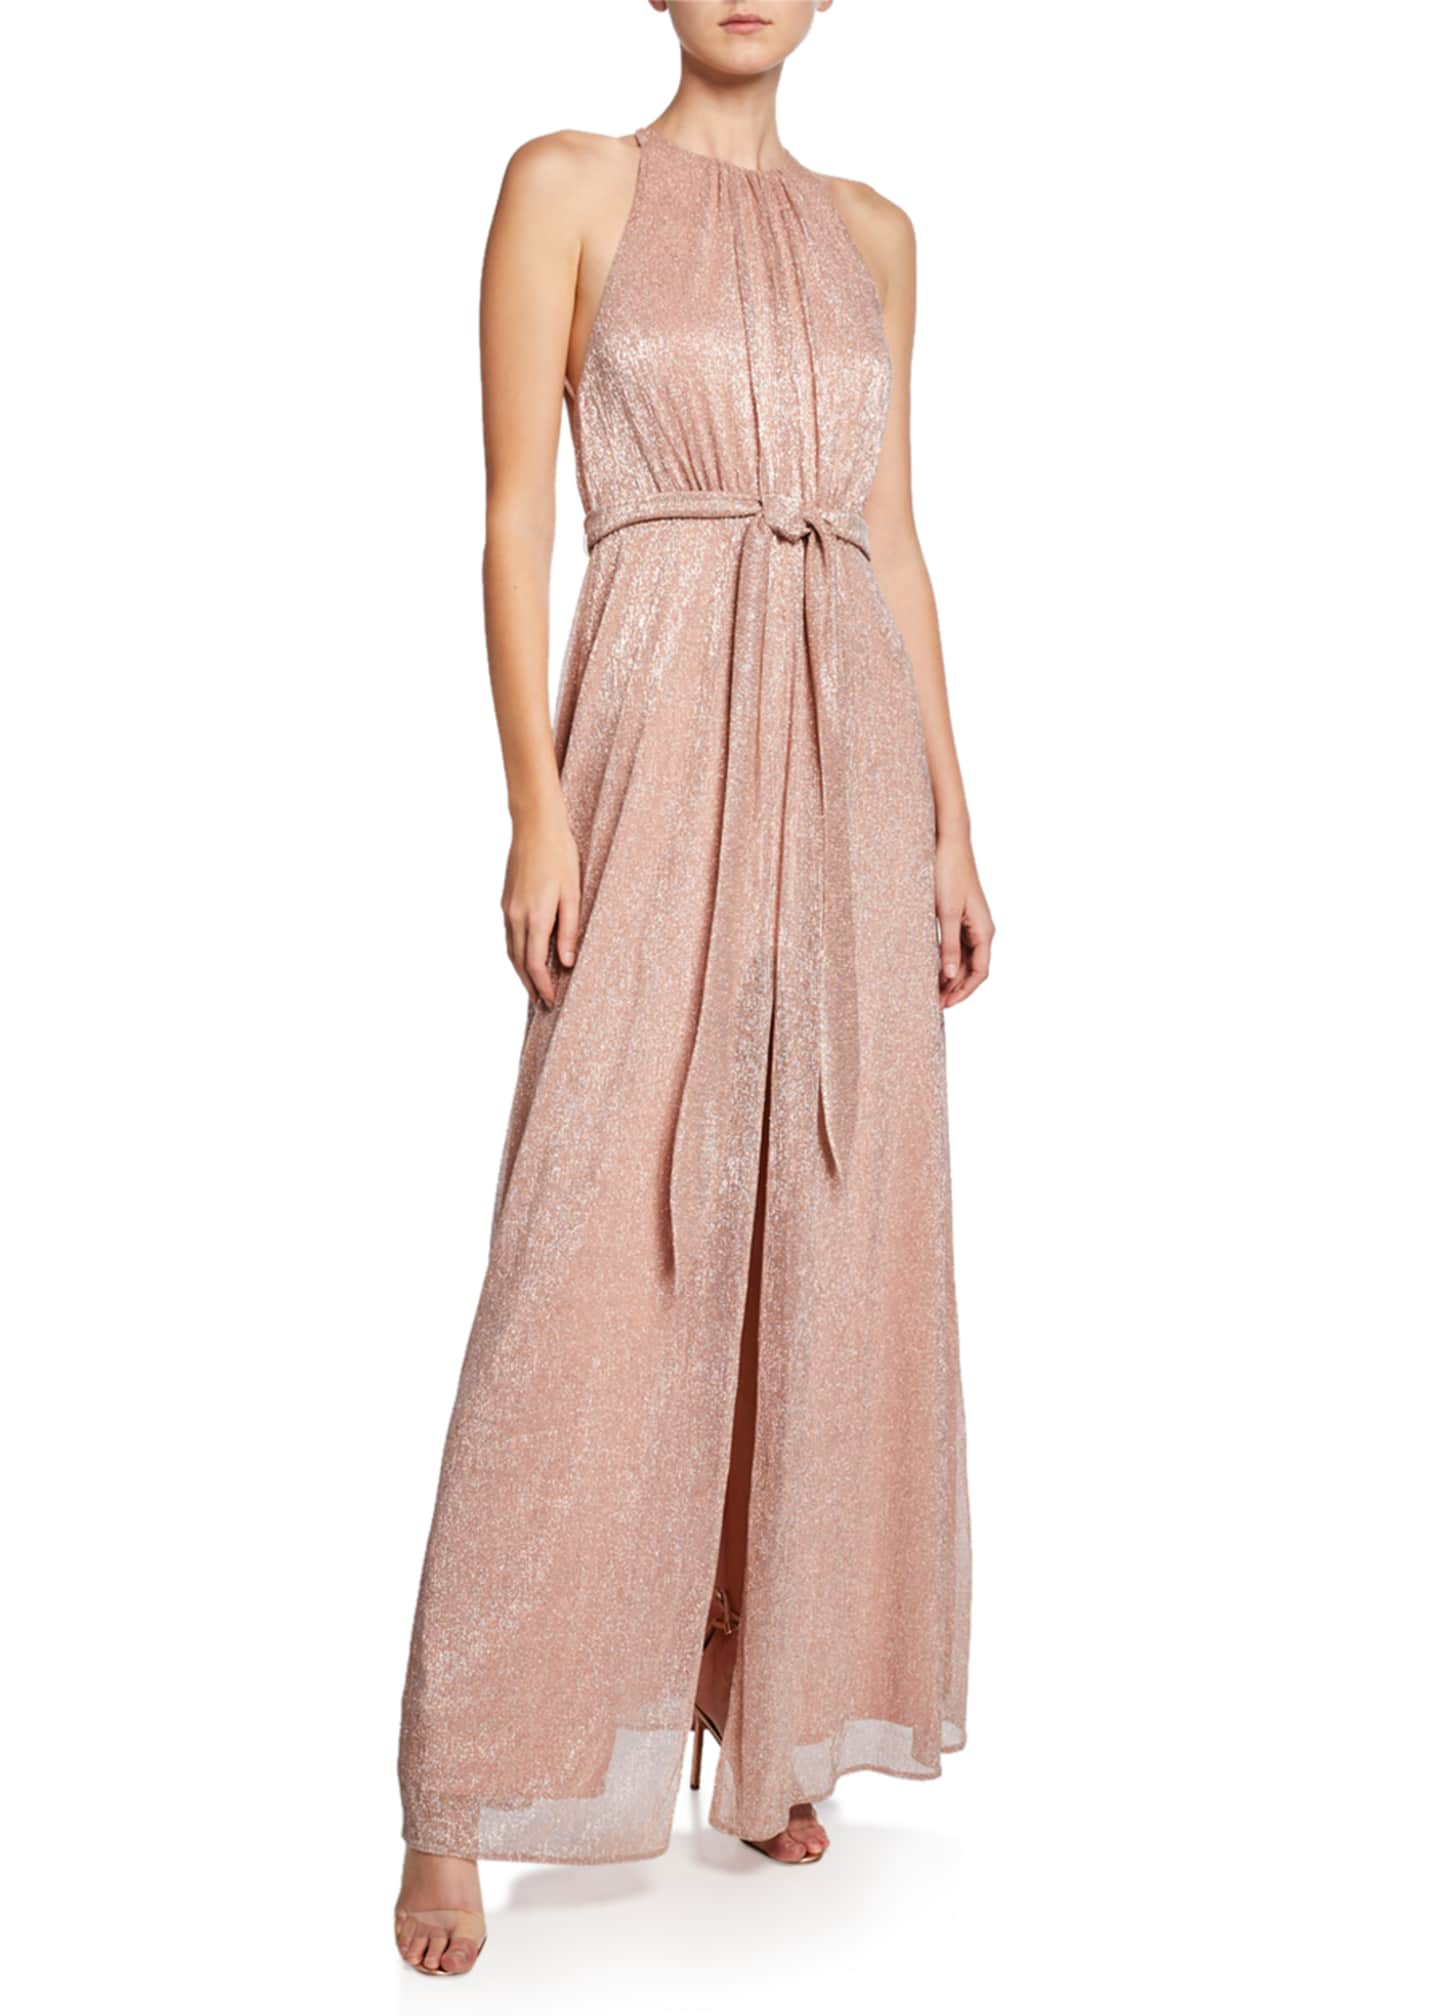 Halston Heritage High-Neck Sleeveless Metallic Knit Gown with